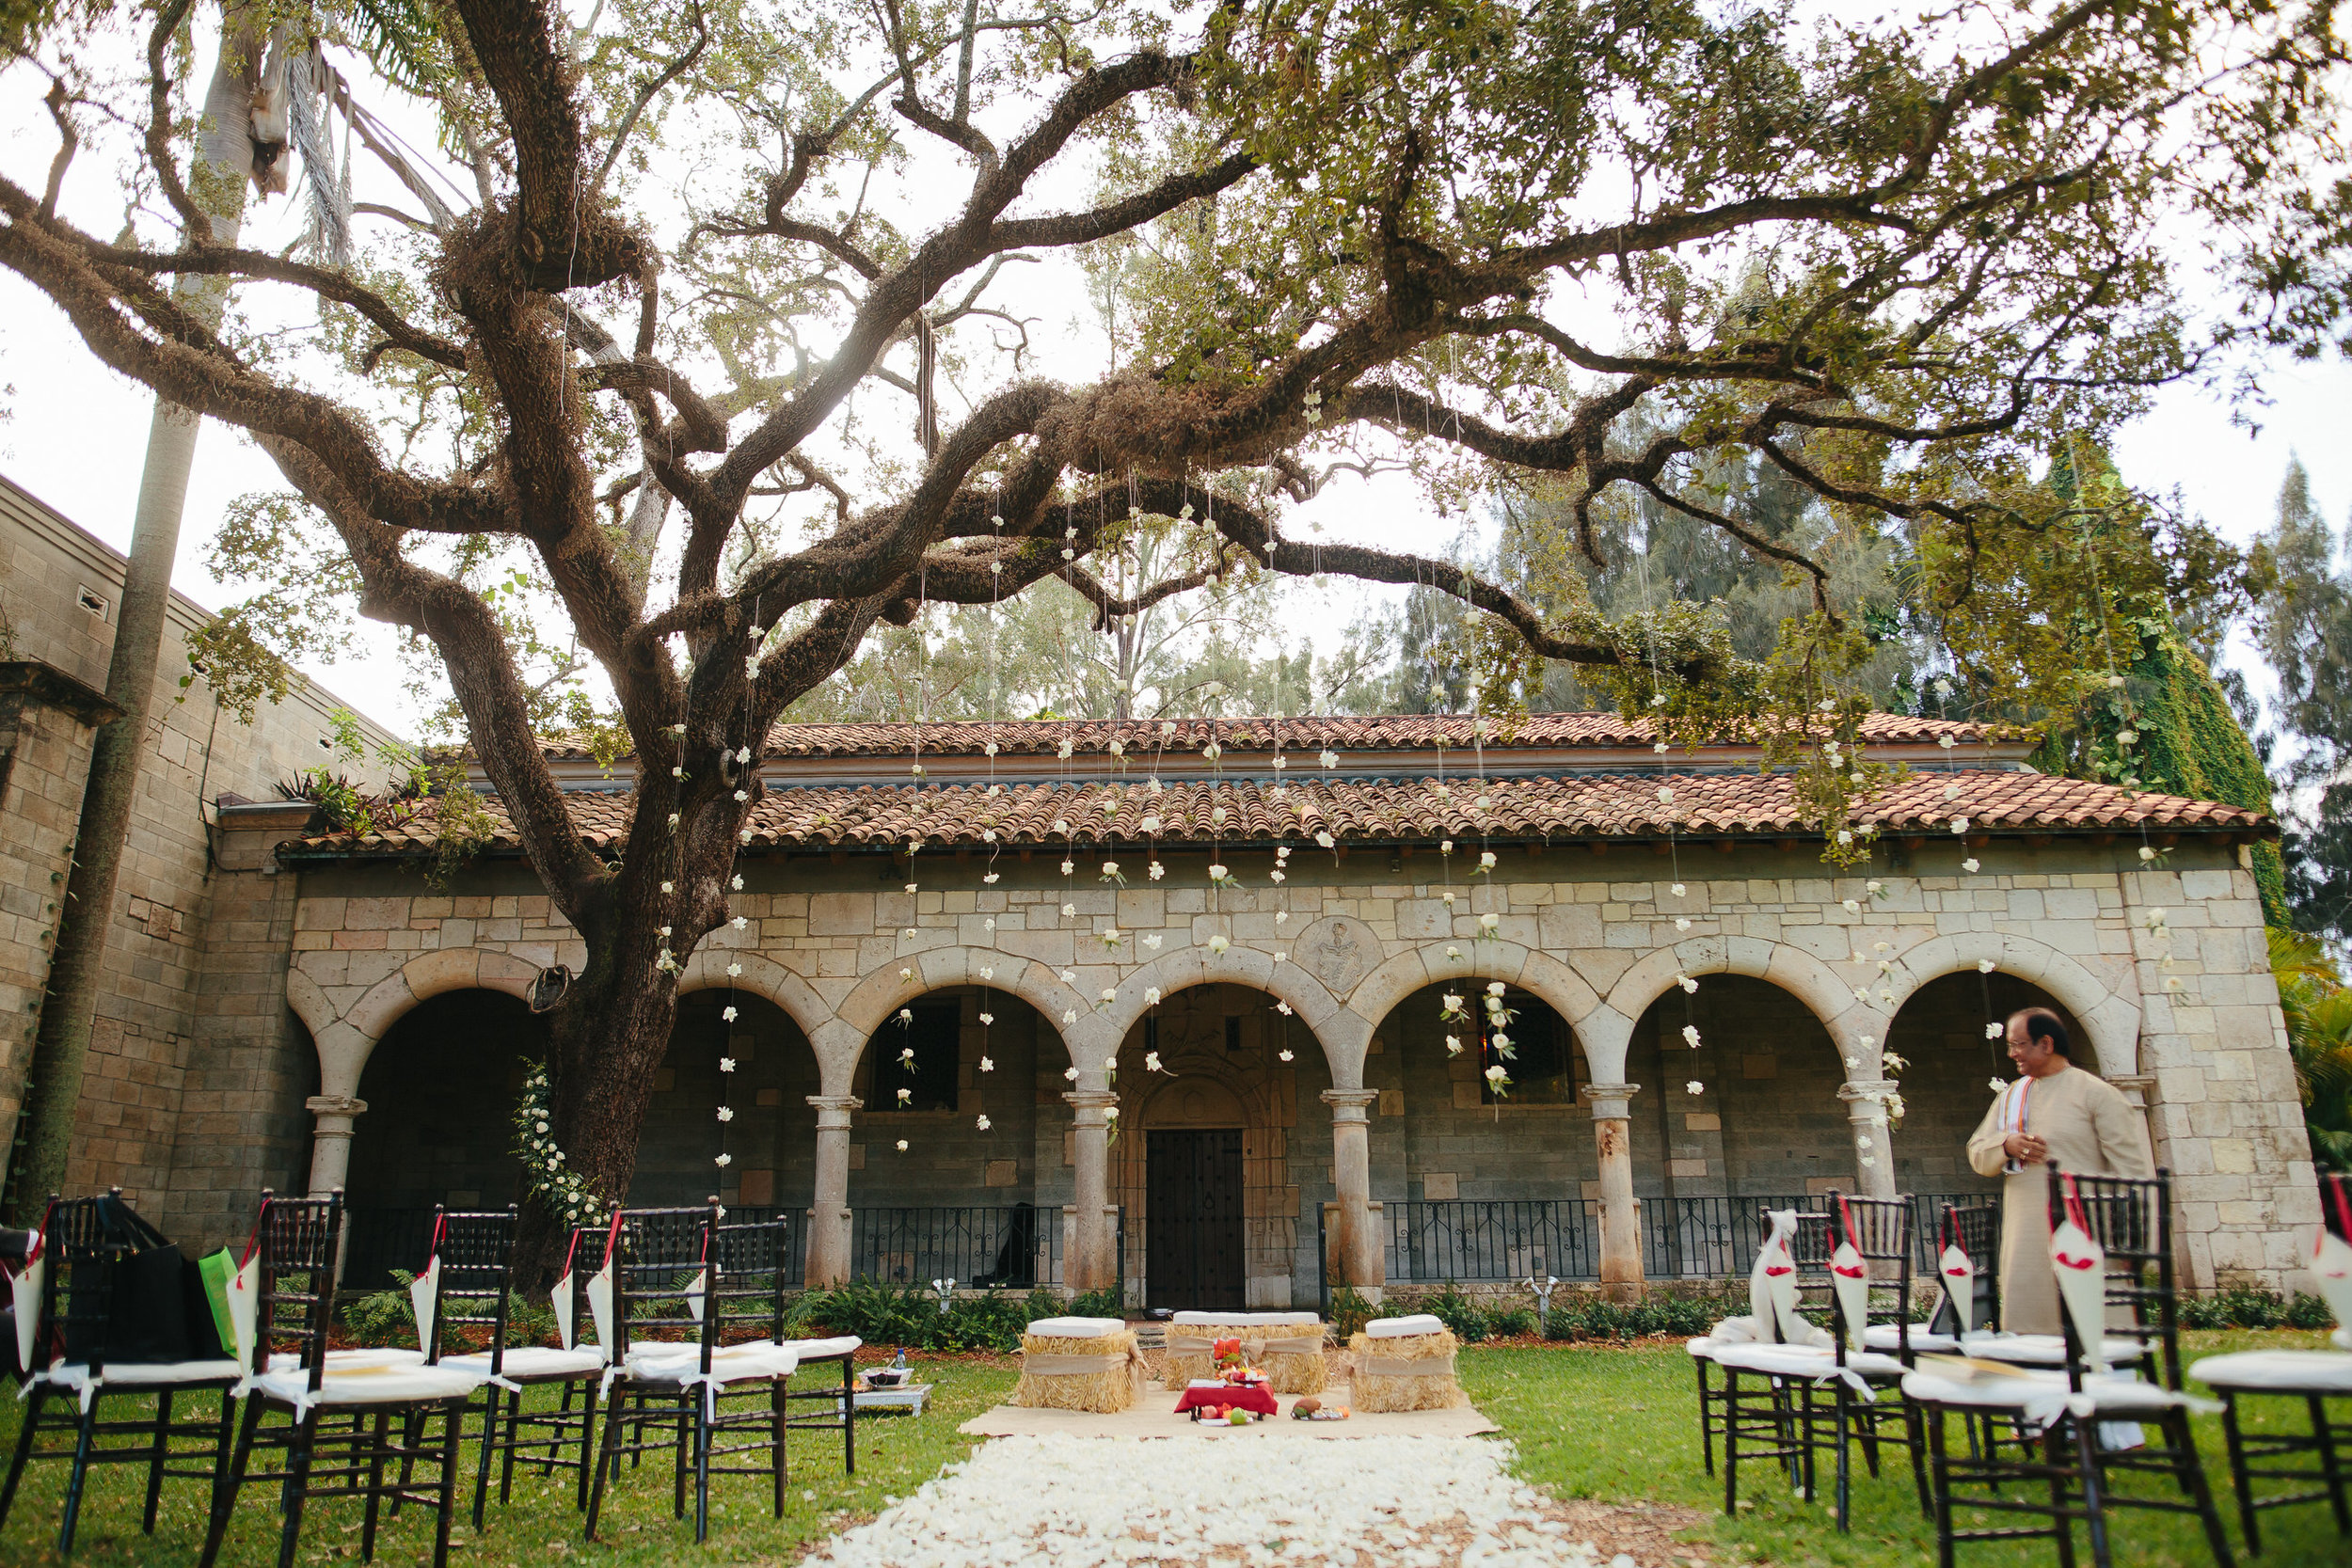 ancient-spanish-monastery-venue-miami-destination-wedding-photographer-tiny-house-photo.jpg